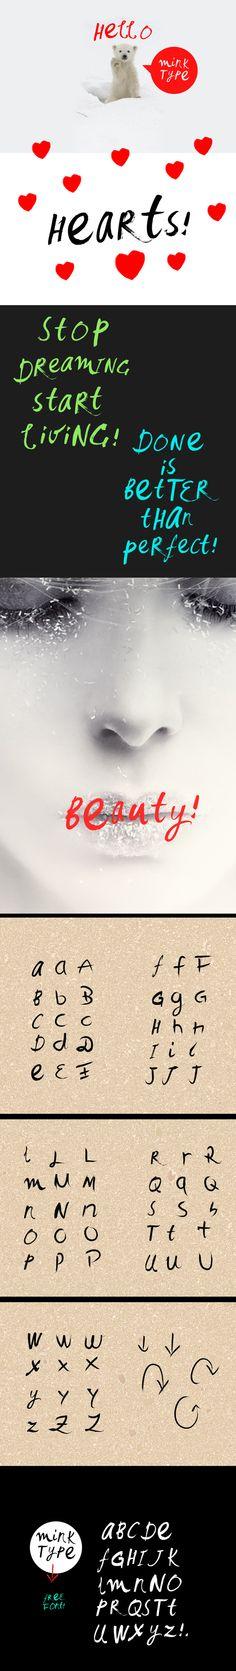 Mink Type - Free Font by filiz sahin, via Behance